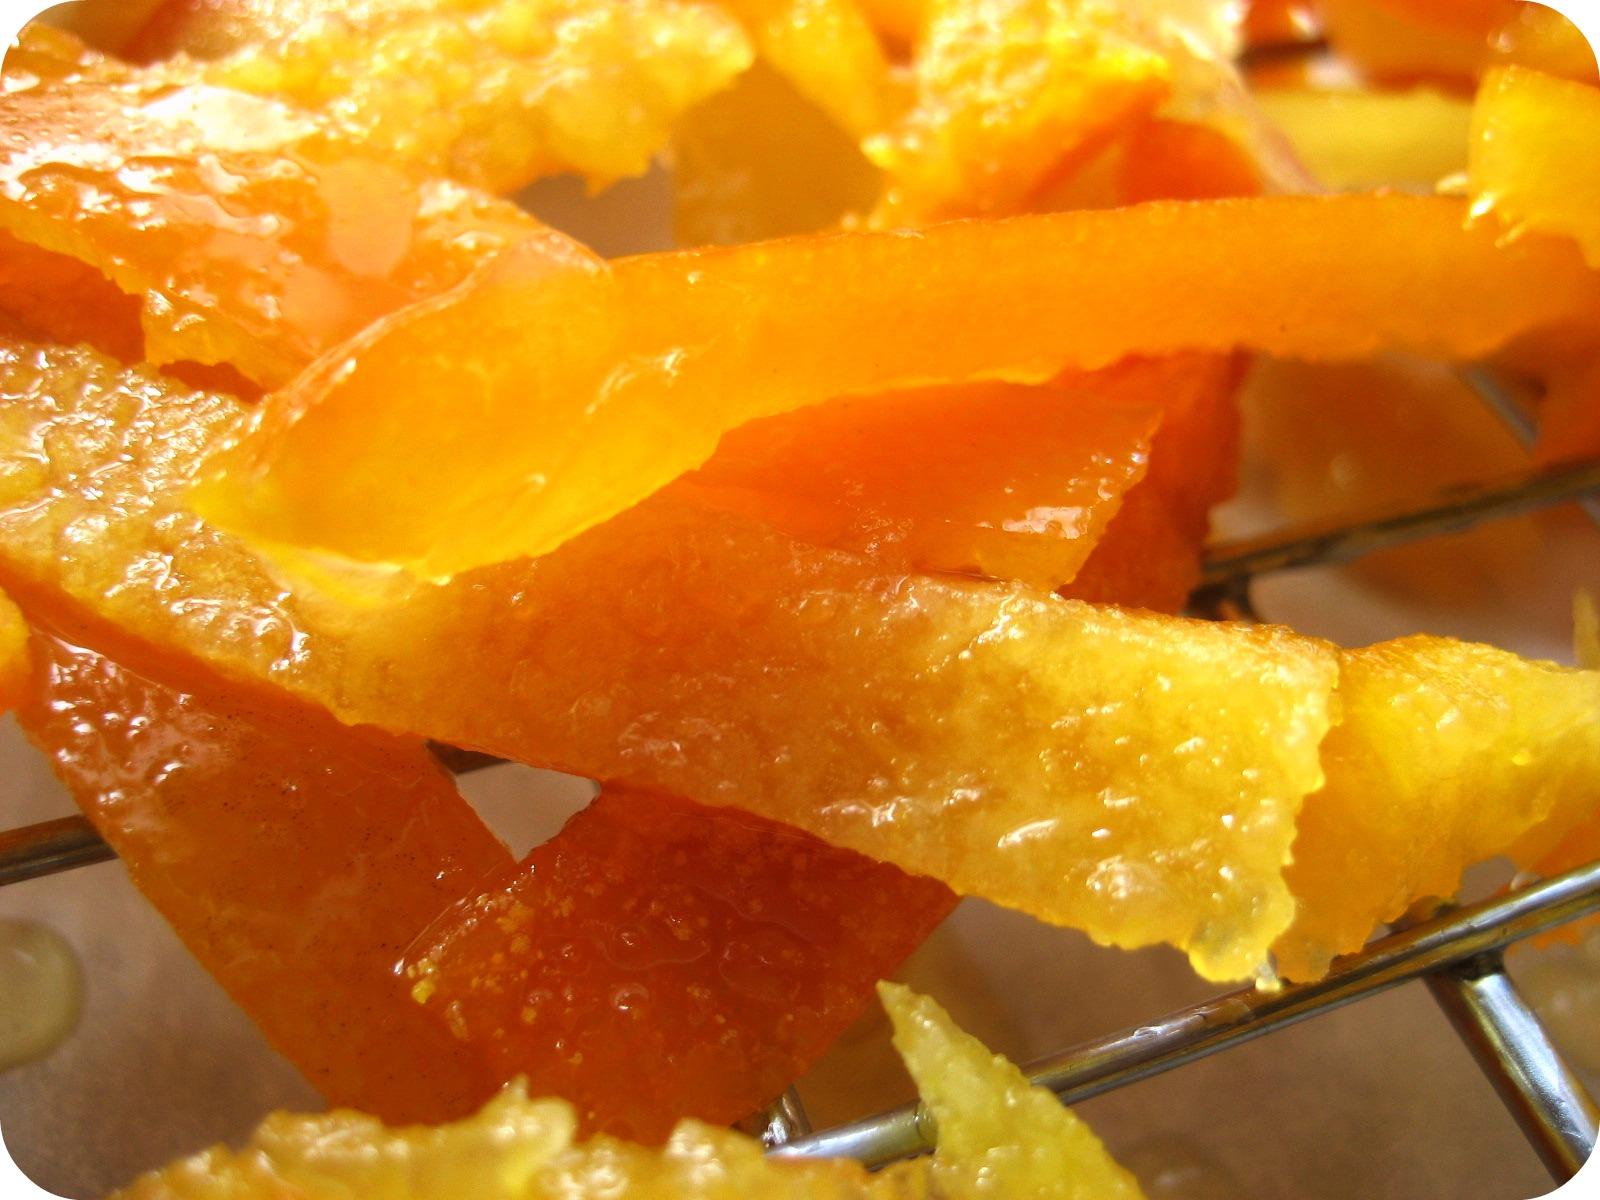 Candied Citrus Recipes — Dishmaps